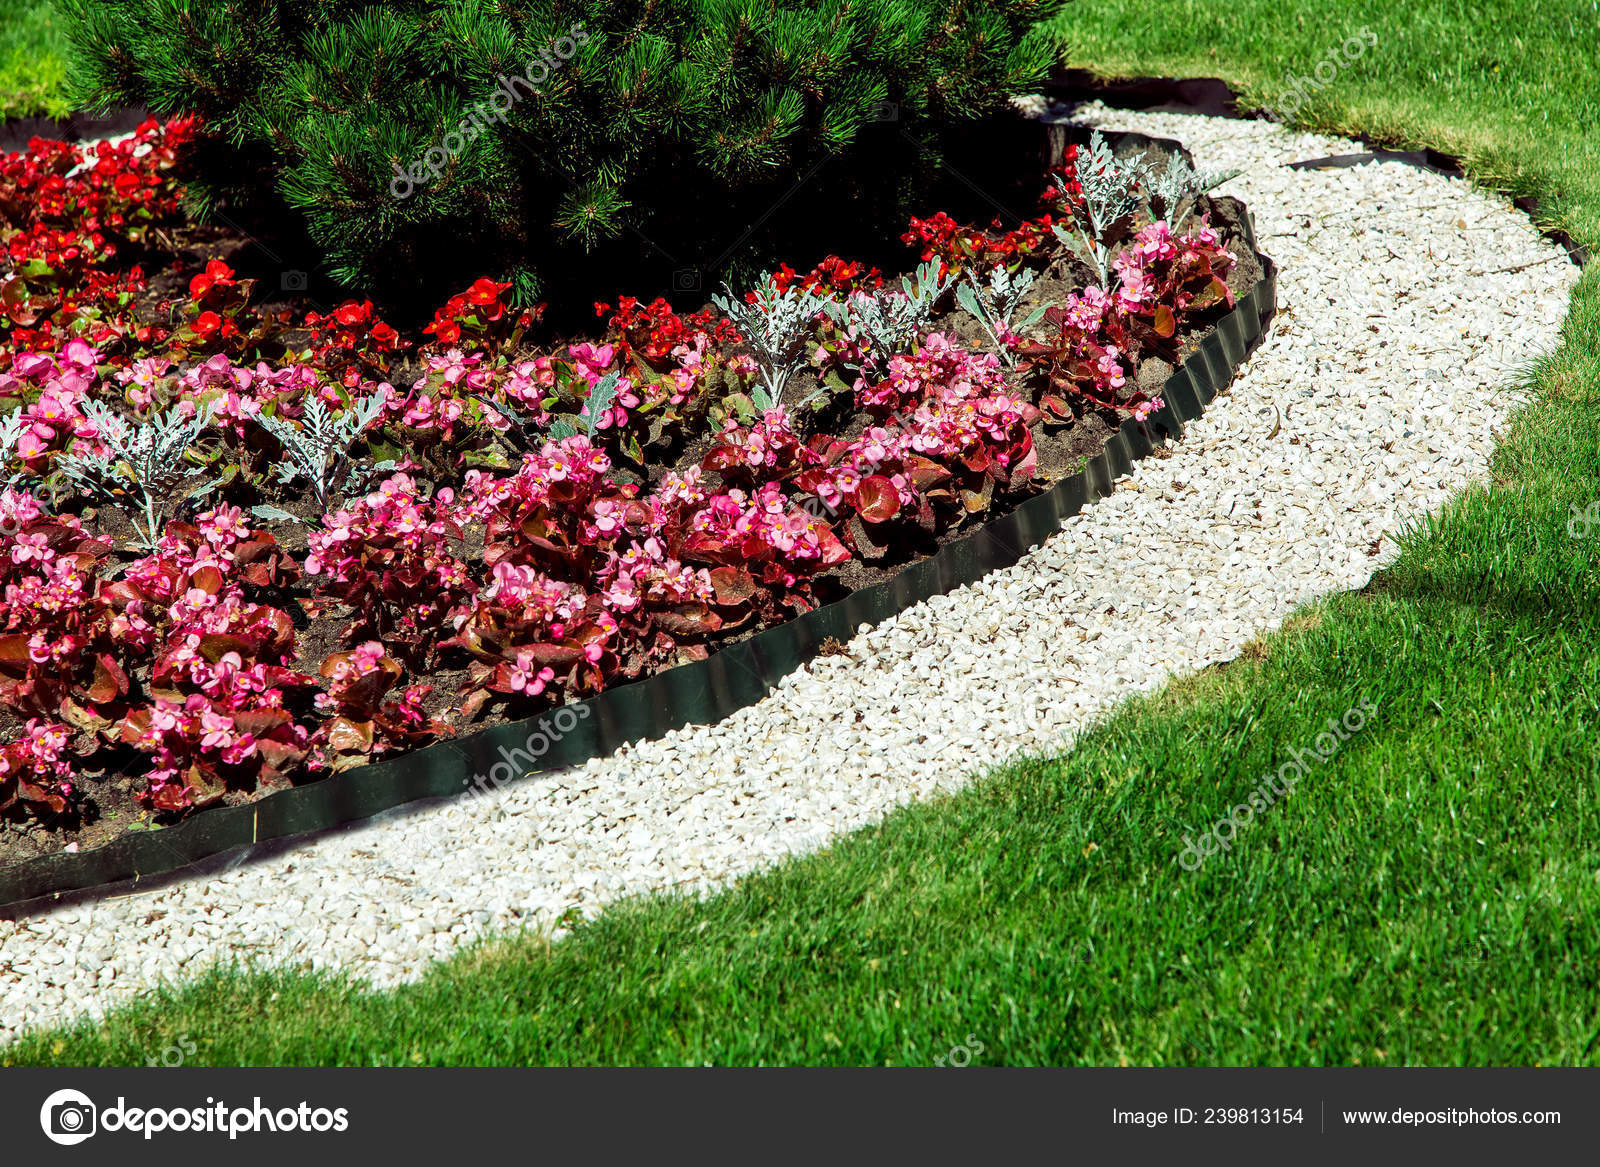 Landscape Design Plants Strewn Pebbles Flowerbed Green Lawn Close